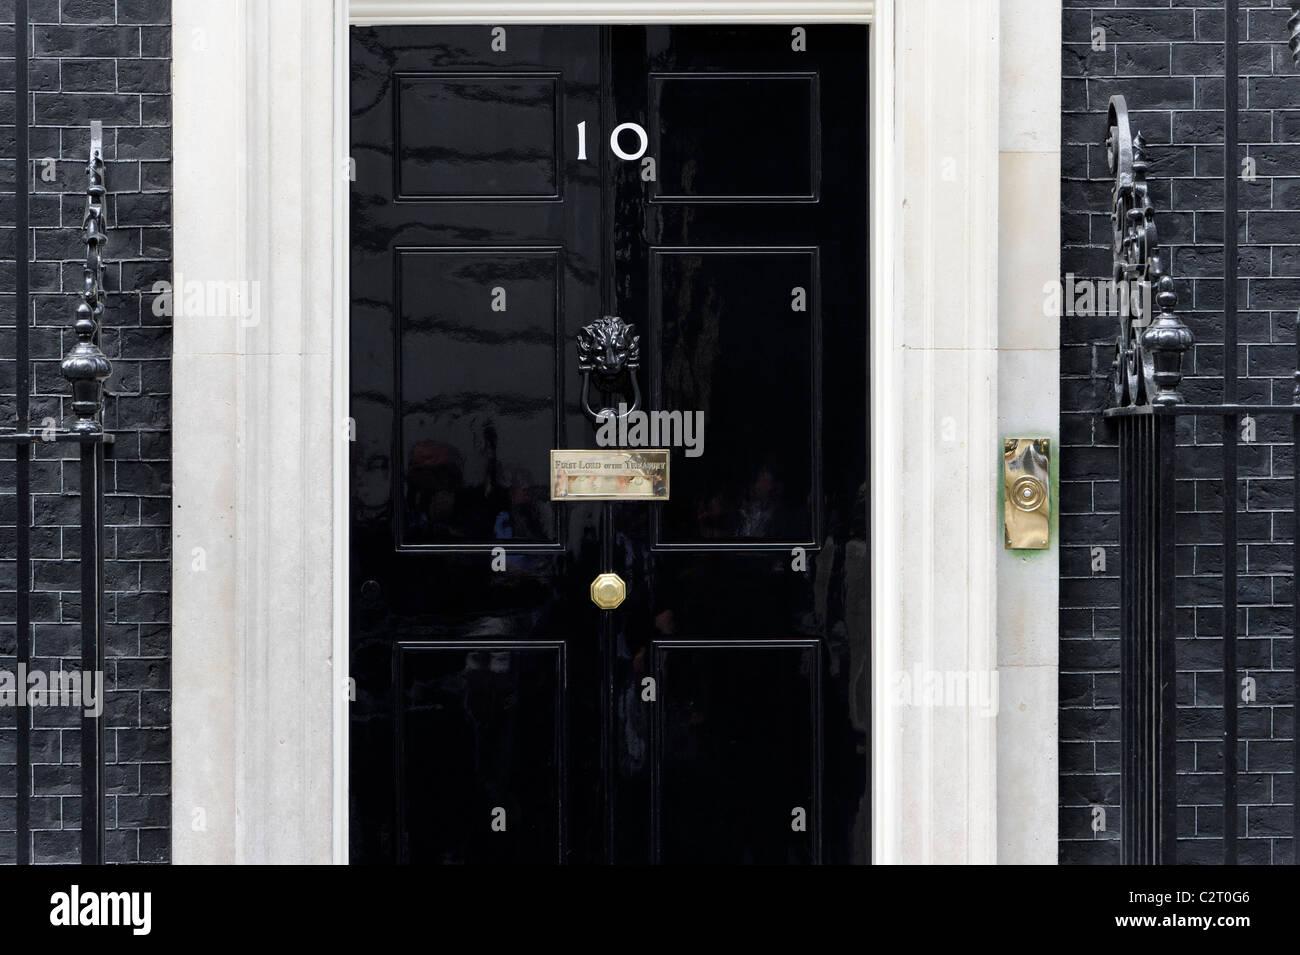 10 Downing Street, London. - Stock Image